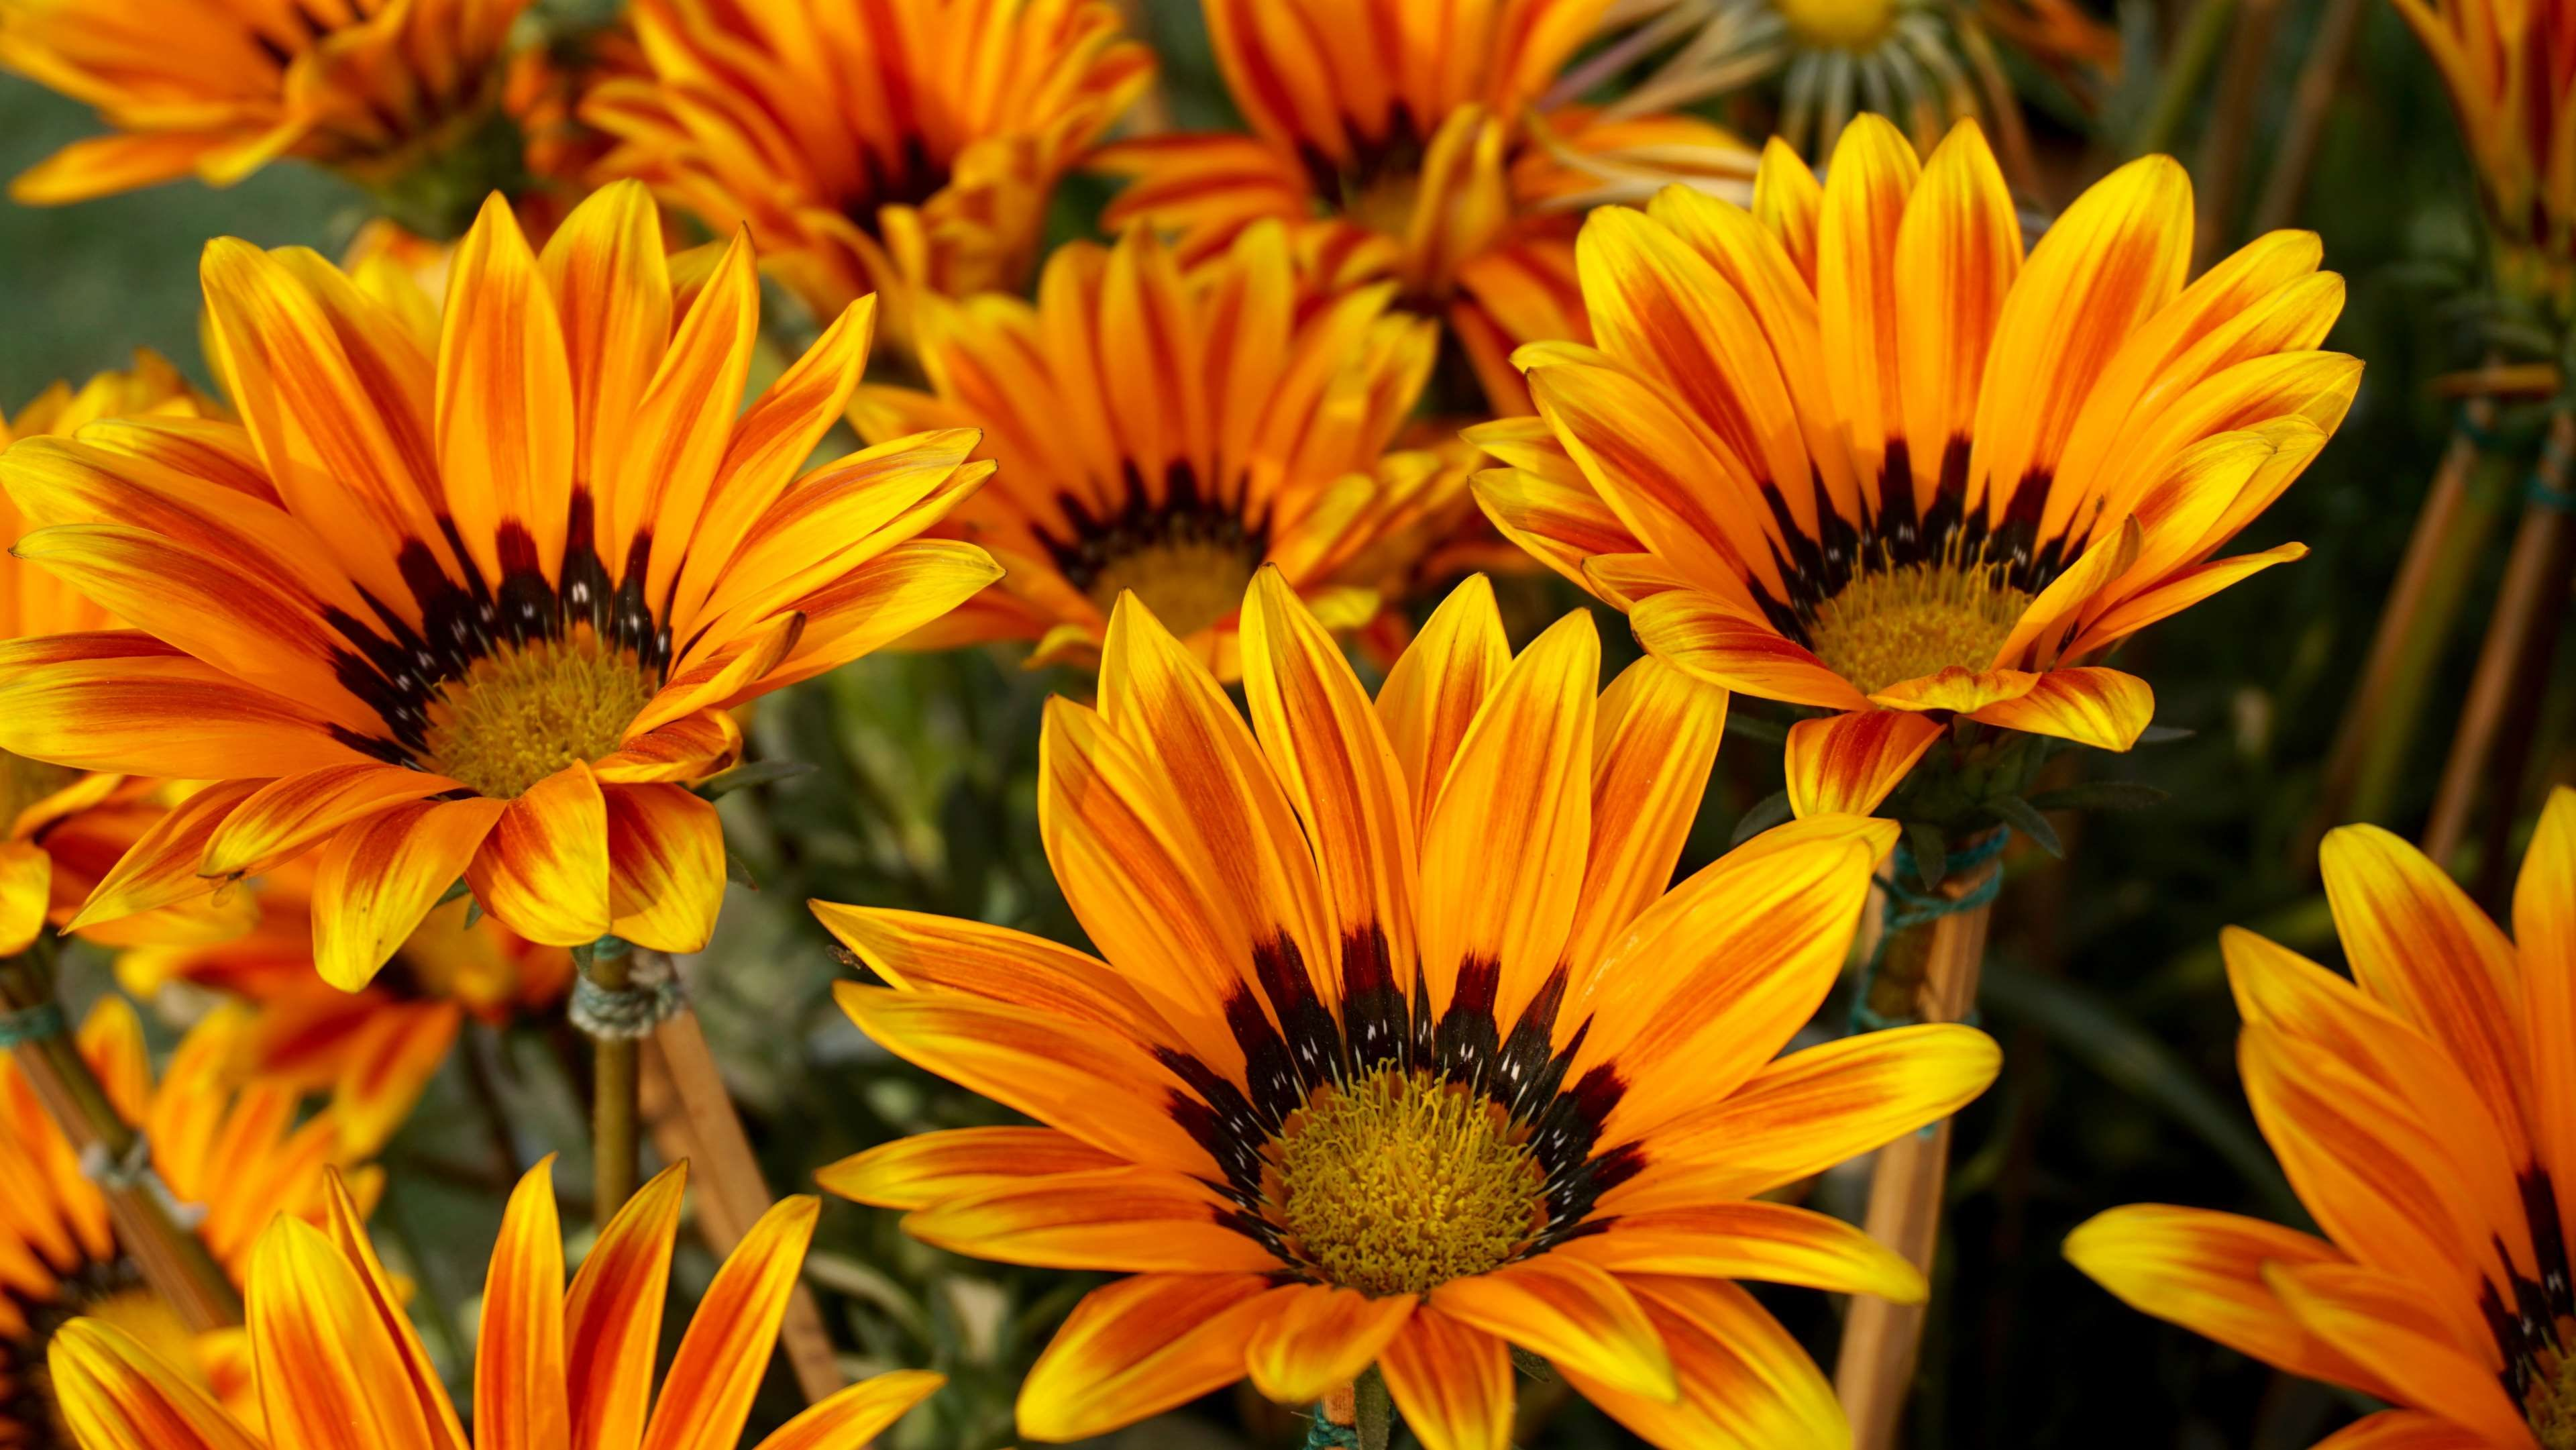 Beautiful flowers bloom blooming blossom bright bunch of beautiful flowers bloom blooming blossom bright bunch of flowers izmirmasajfo